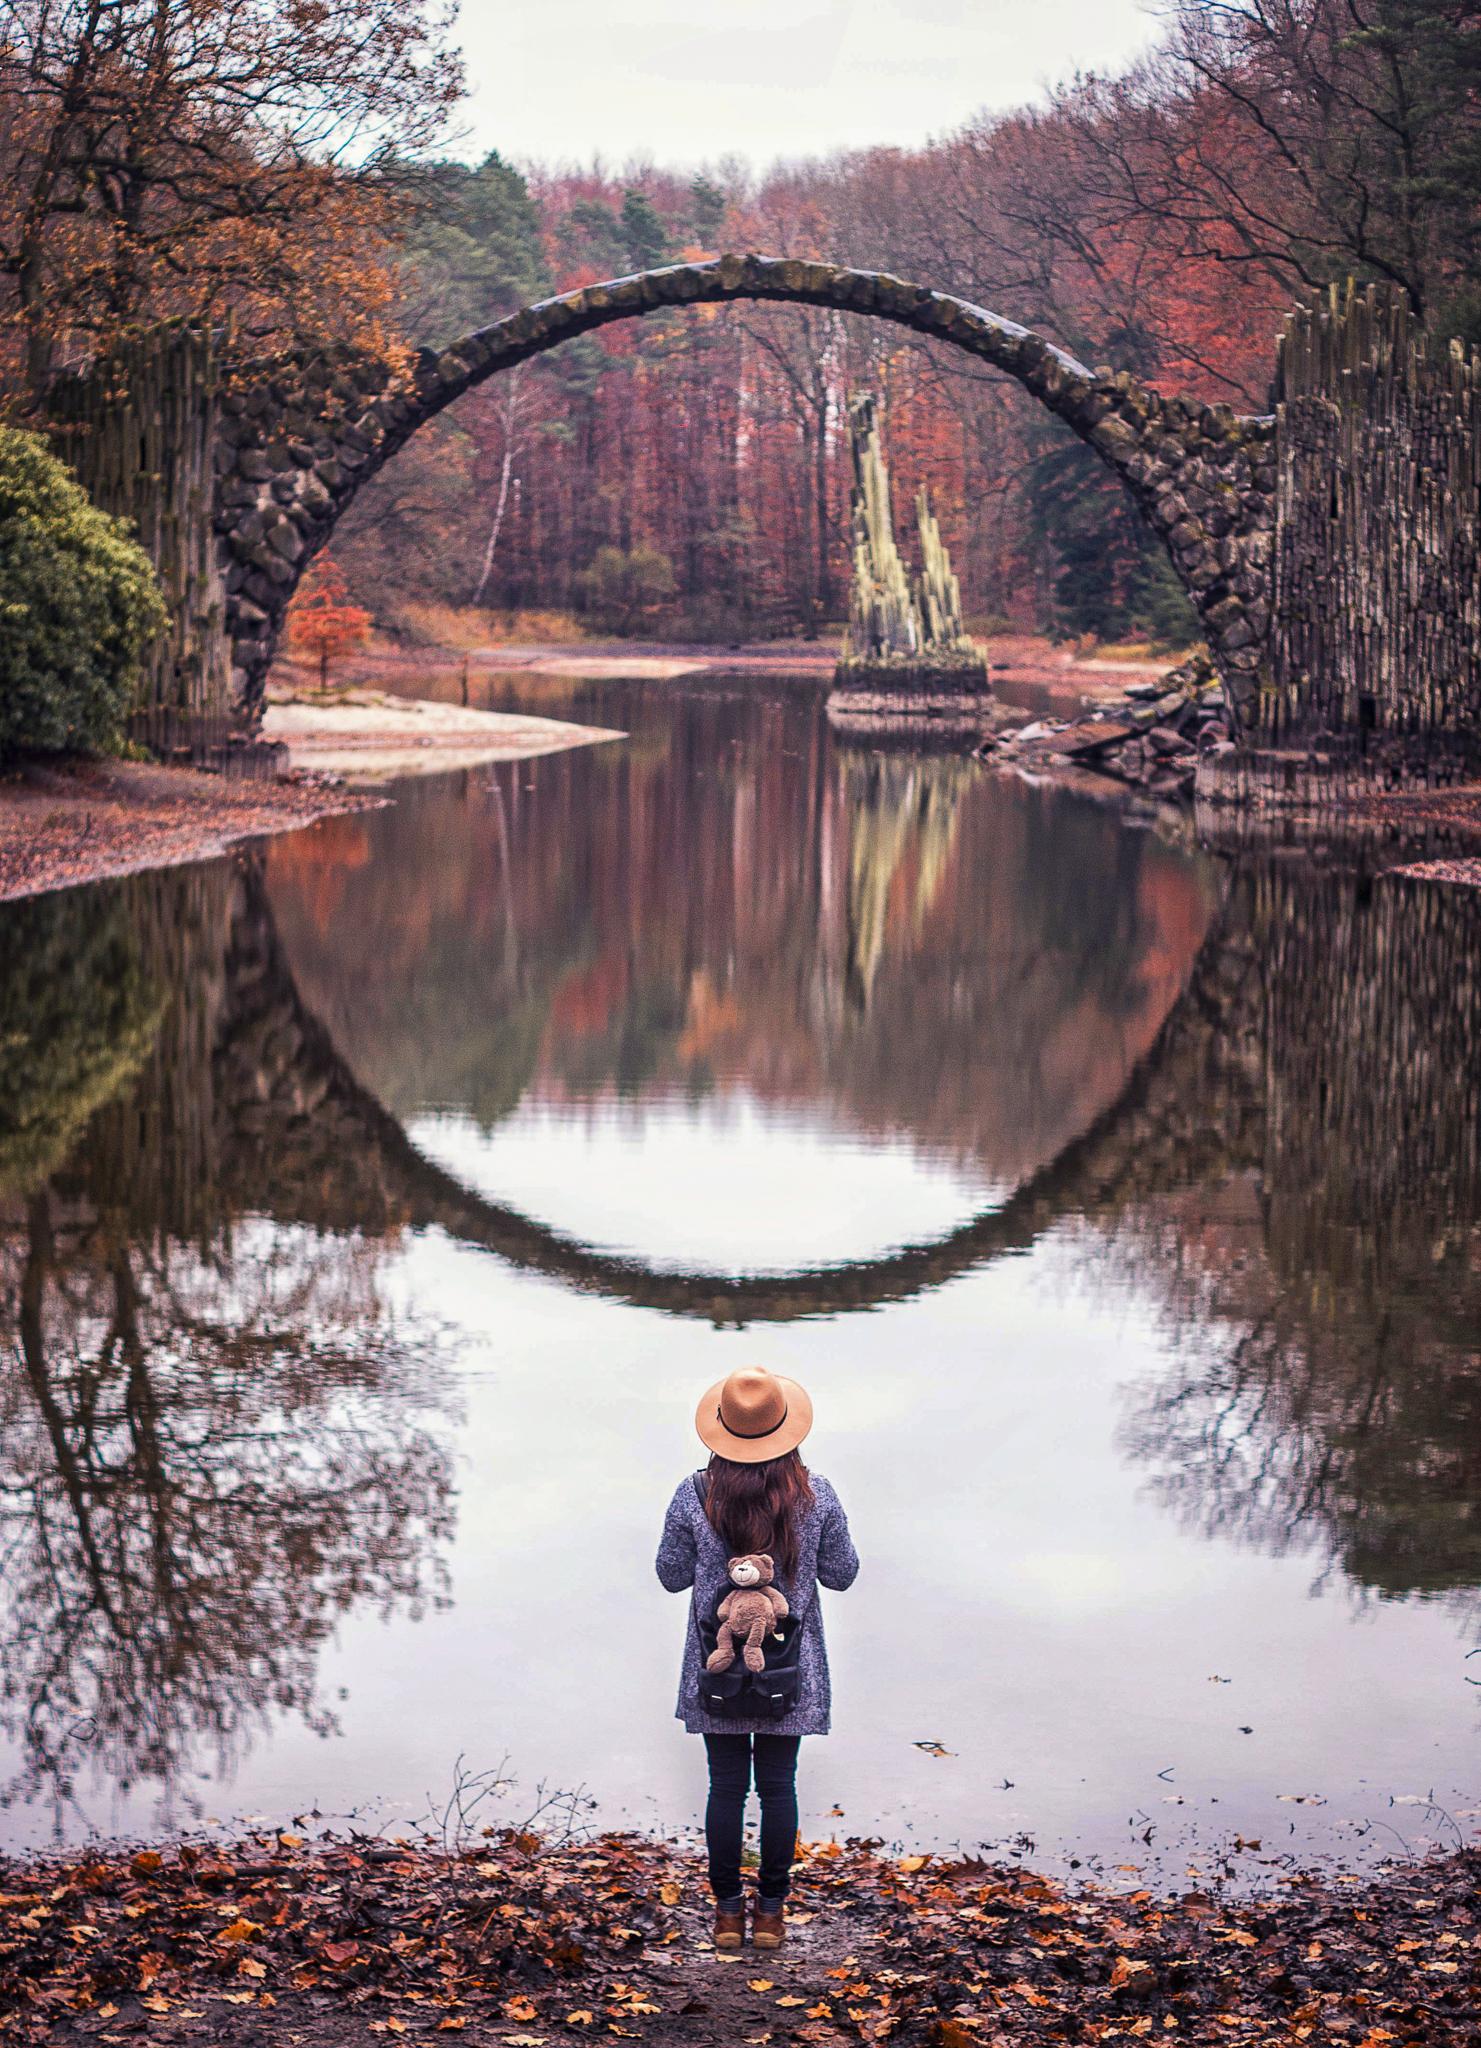 Portal - Devils Bridge - Germany 2017